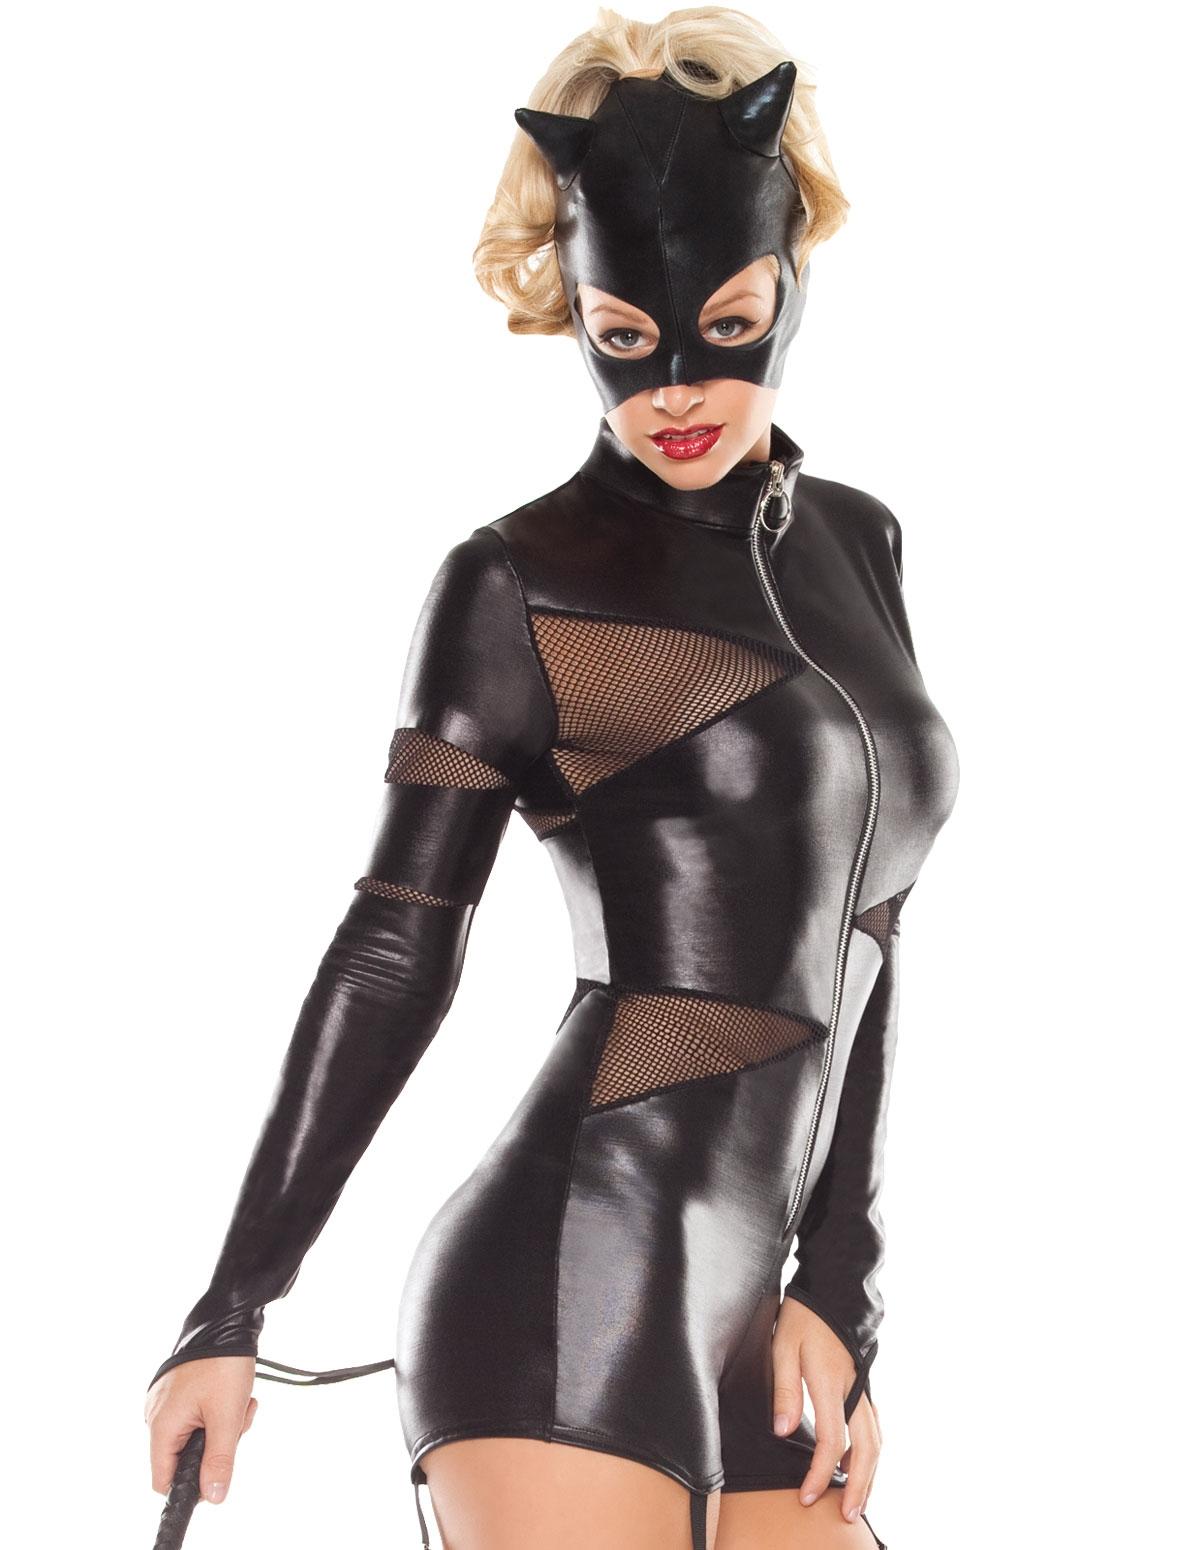 Feline Domineer Costume